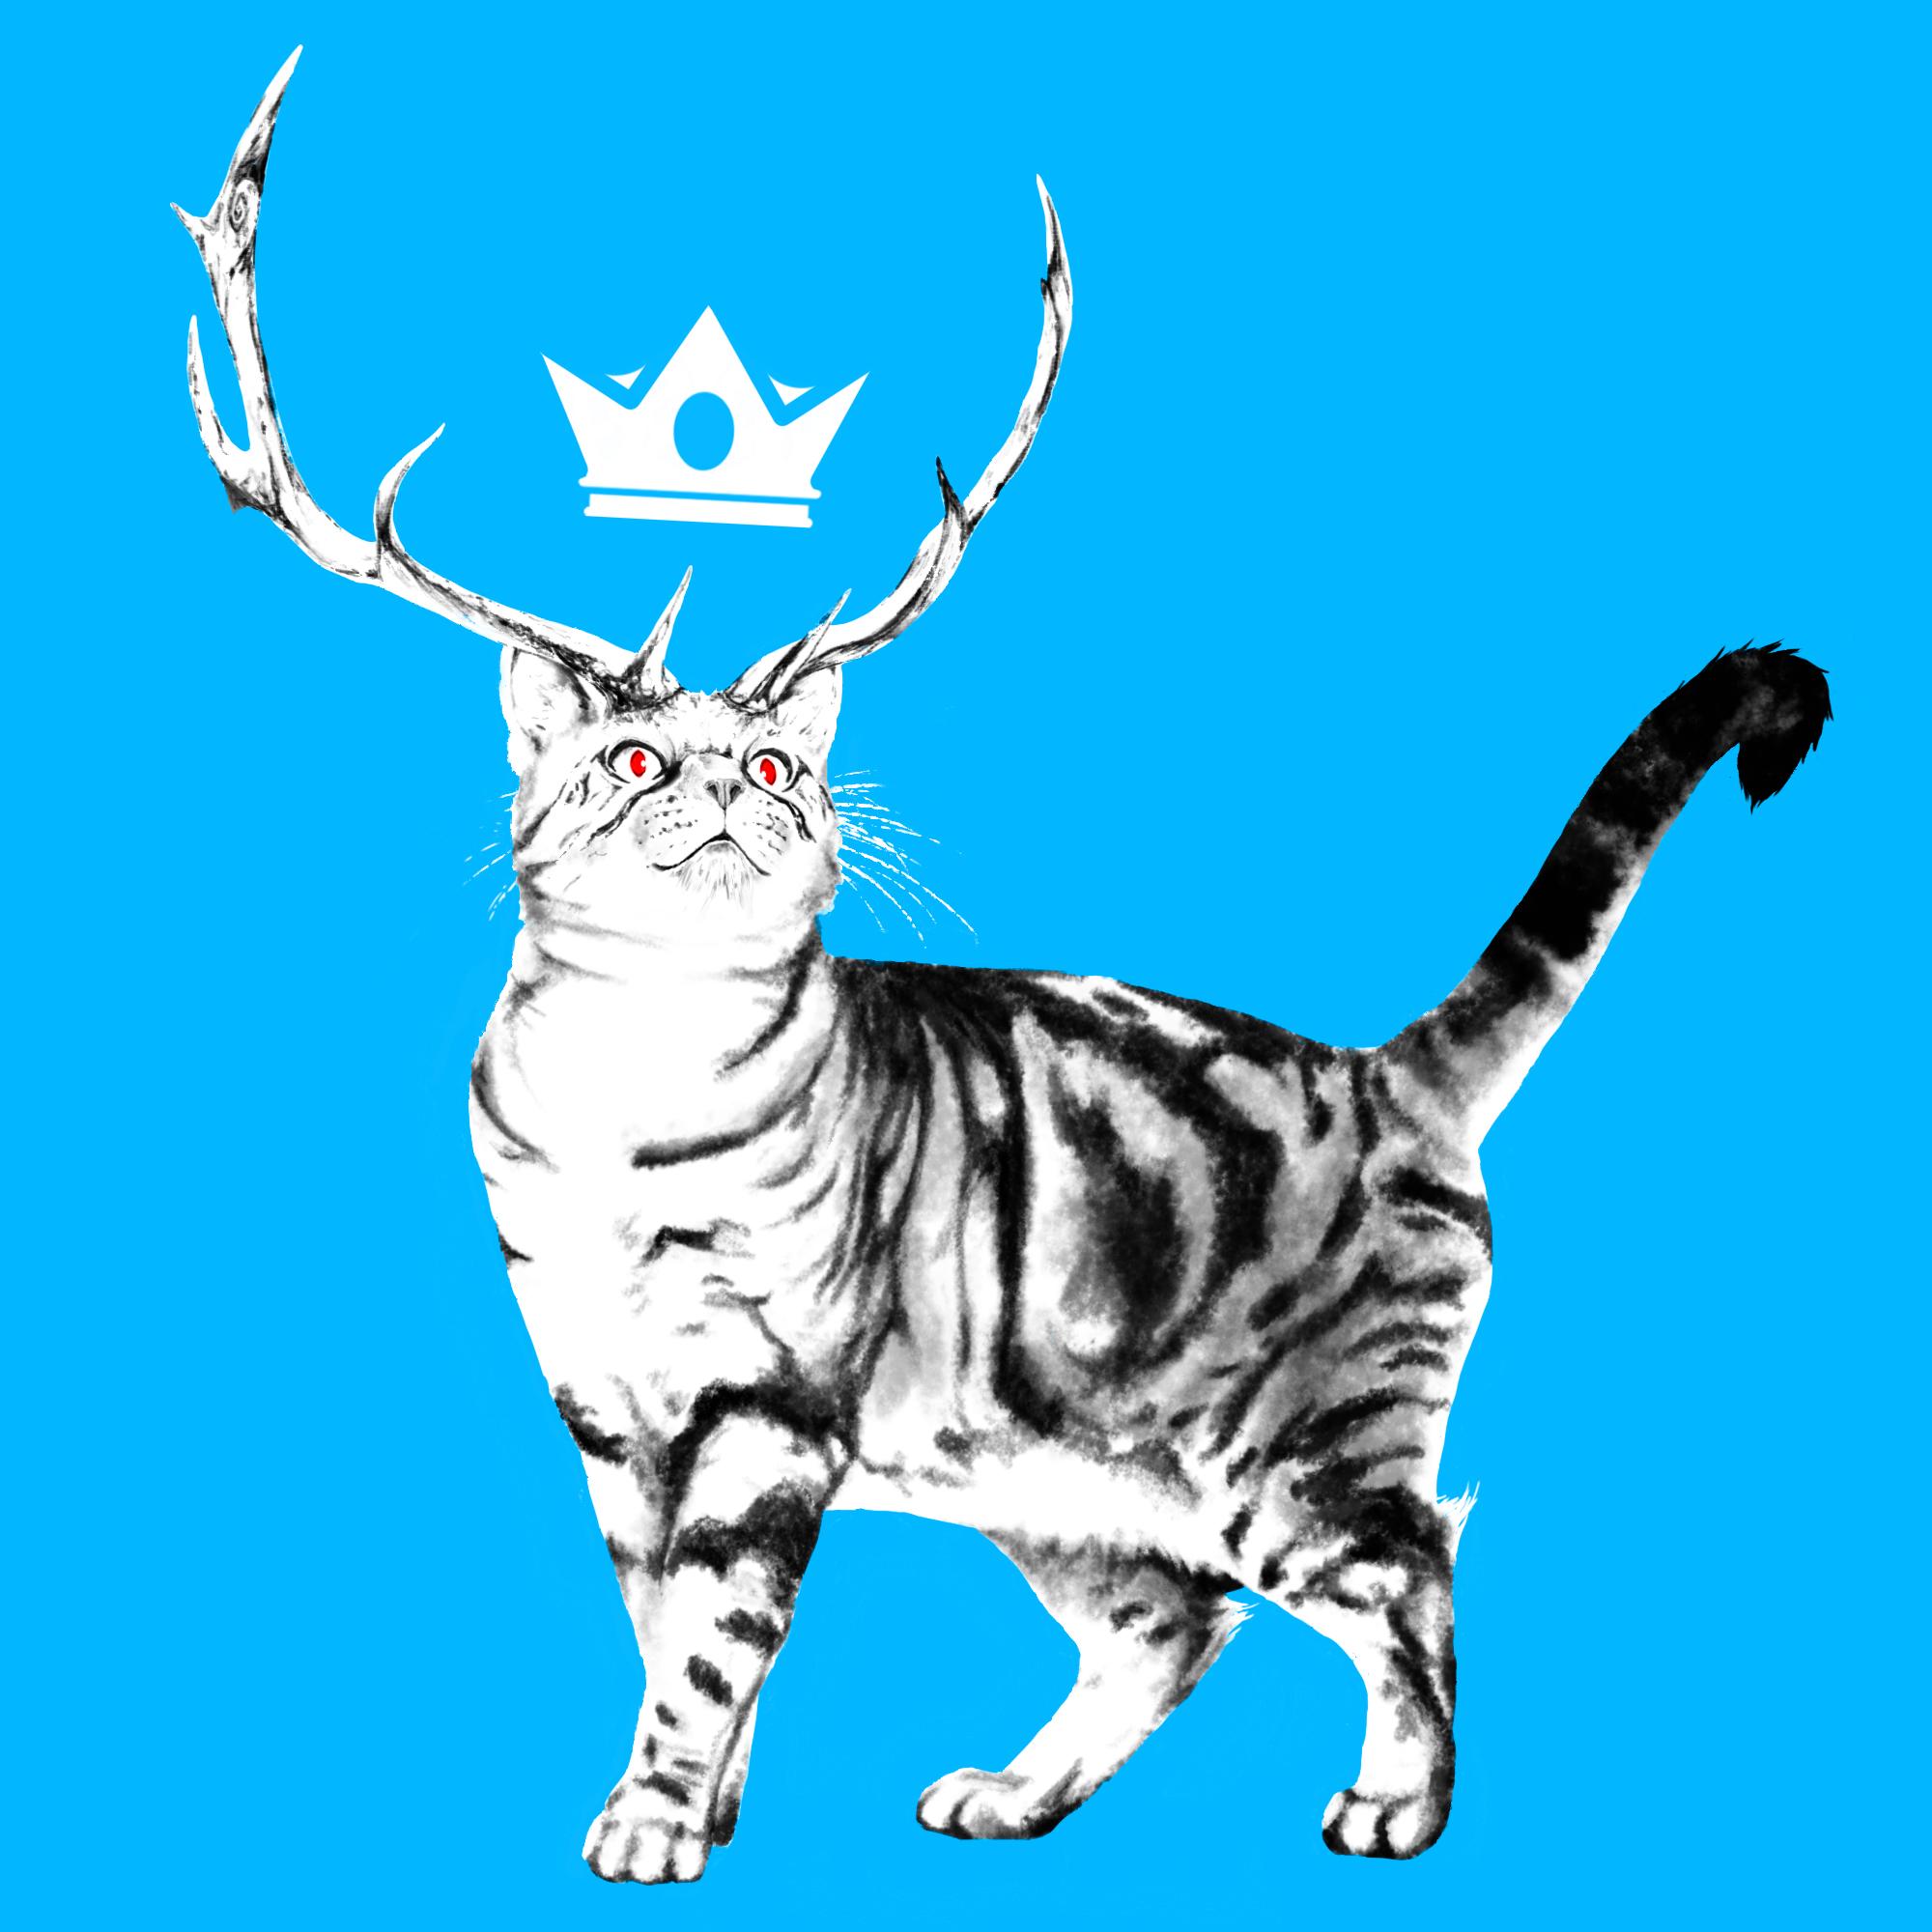 Cat 1